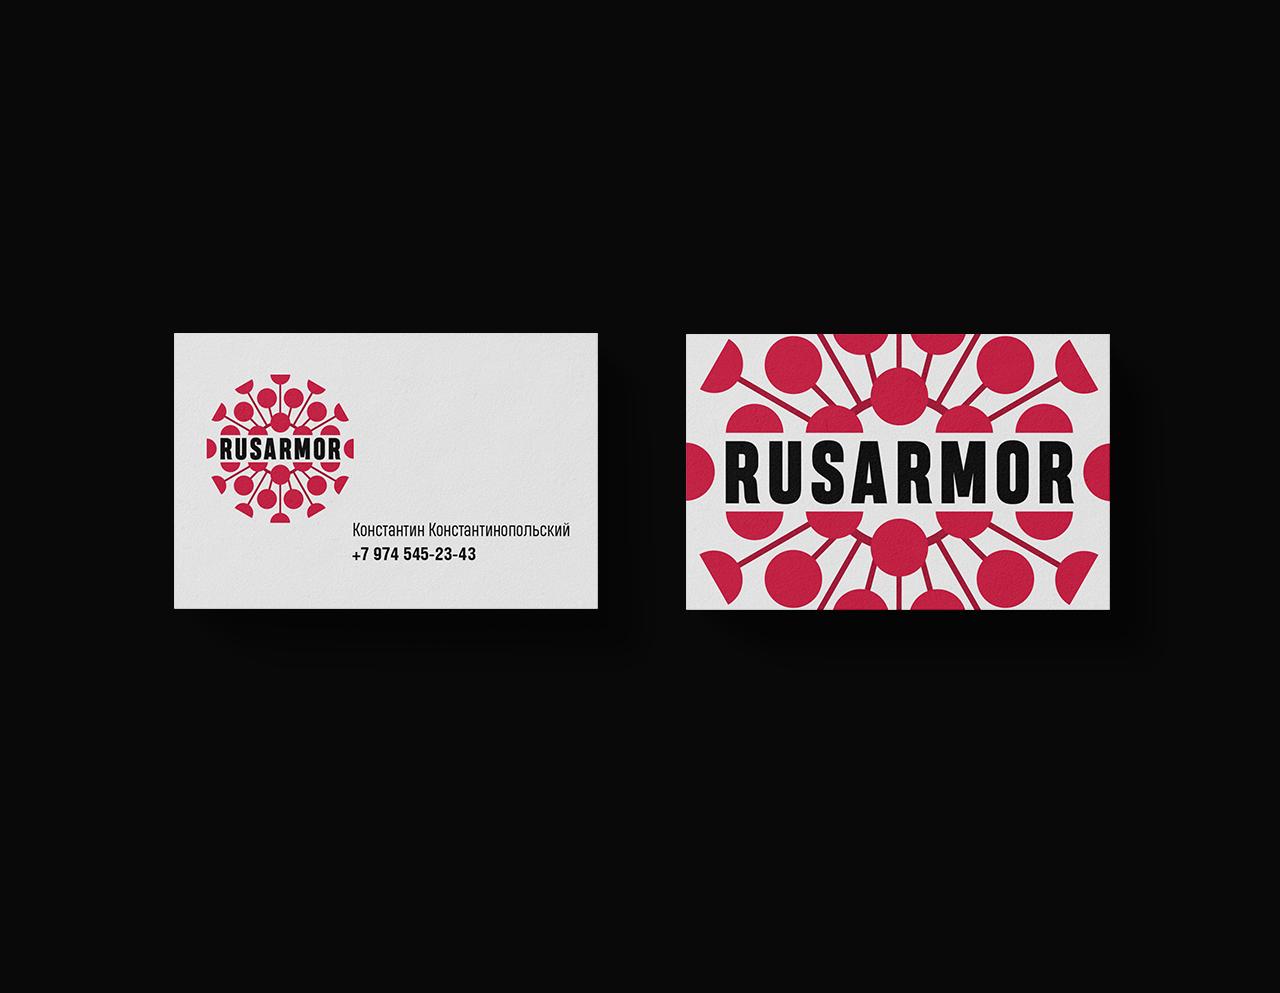 Разработка логотипа технологического стартапа РУСАРМОР фото f_9745a0cef61ab15c.jpg